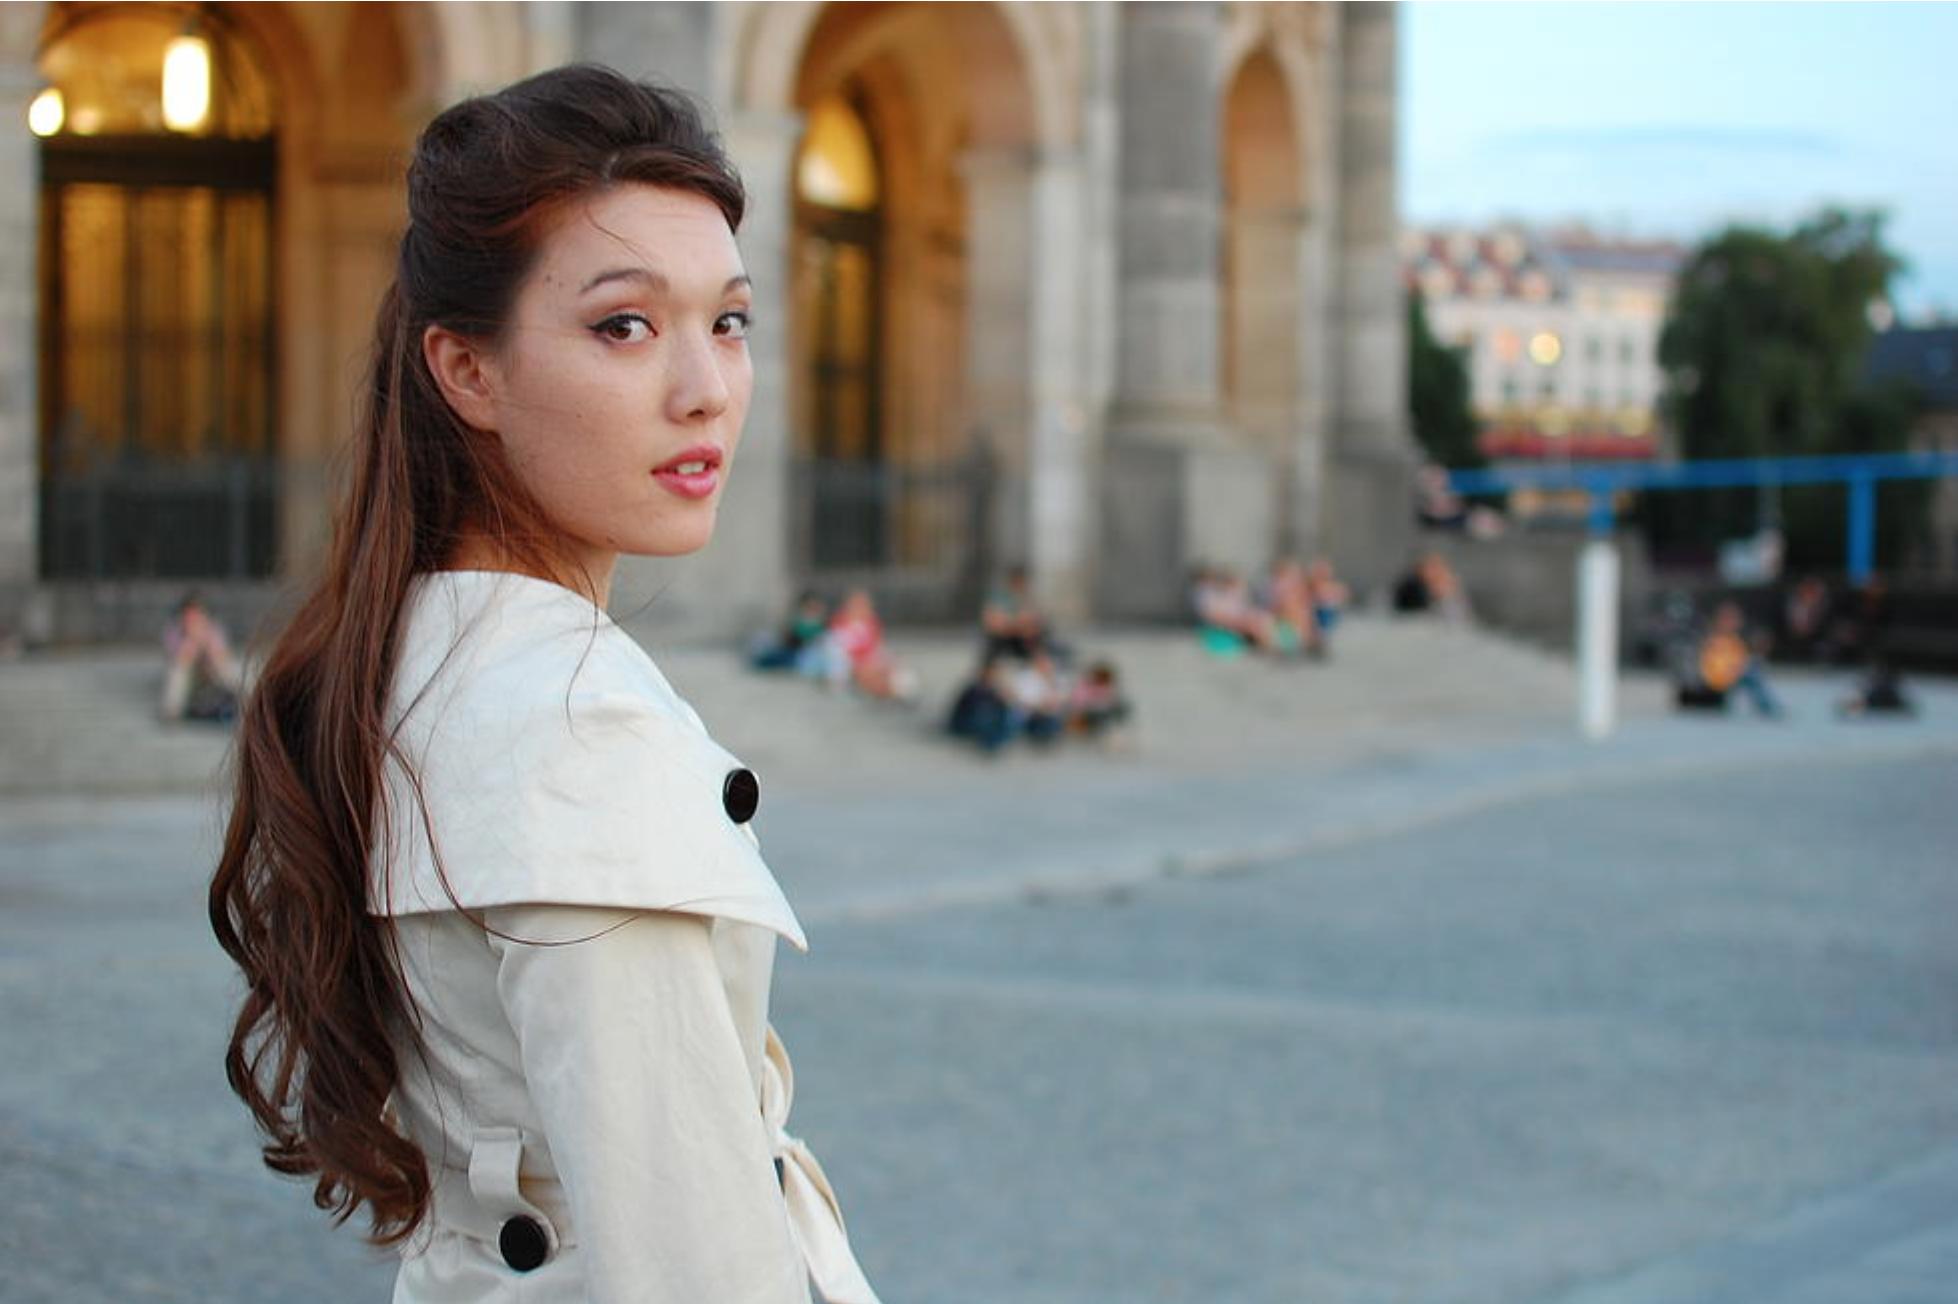 Arianna+Warsaw-Fan.jpg.png